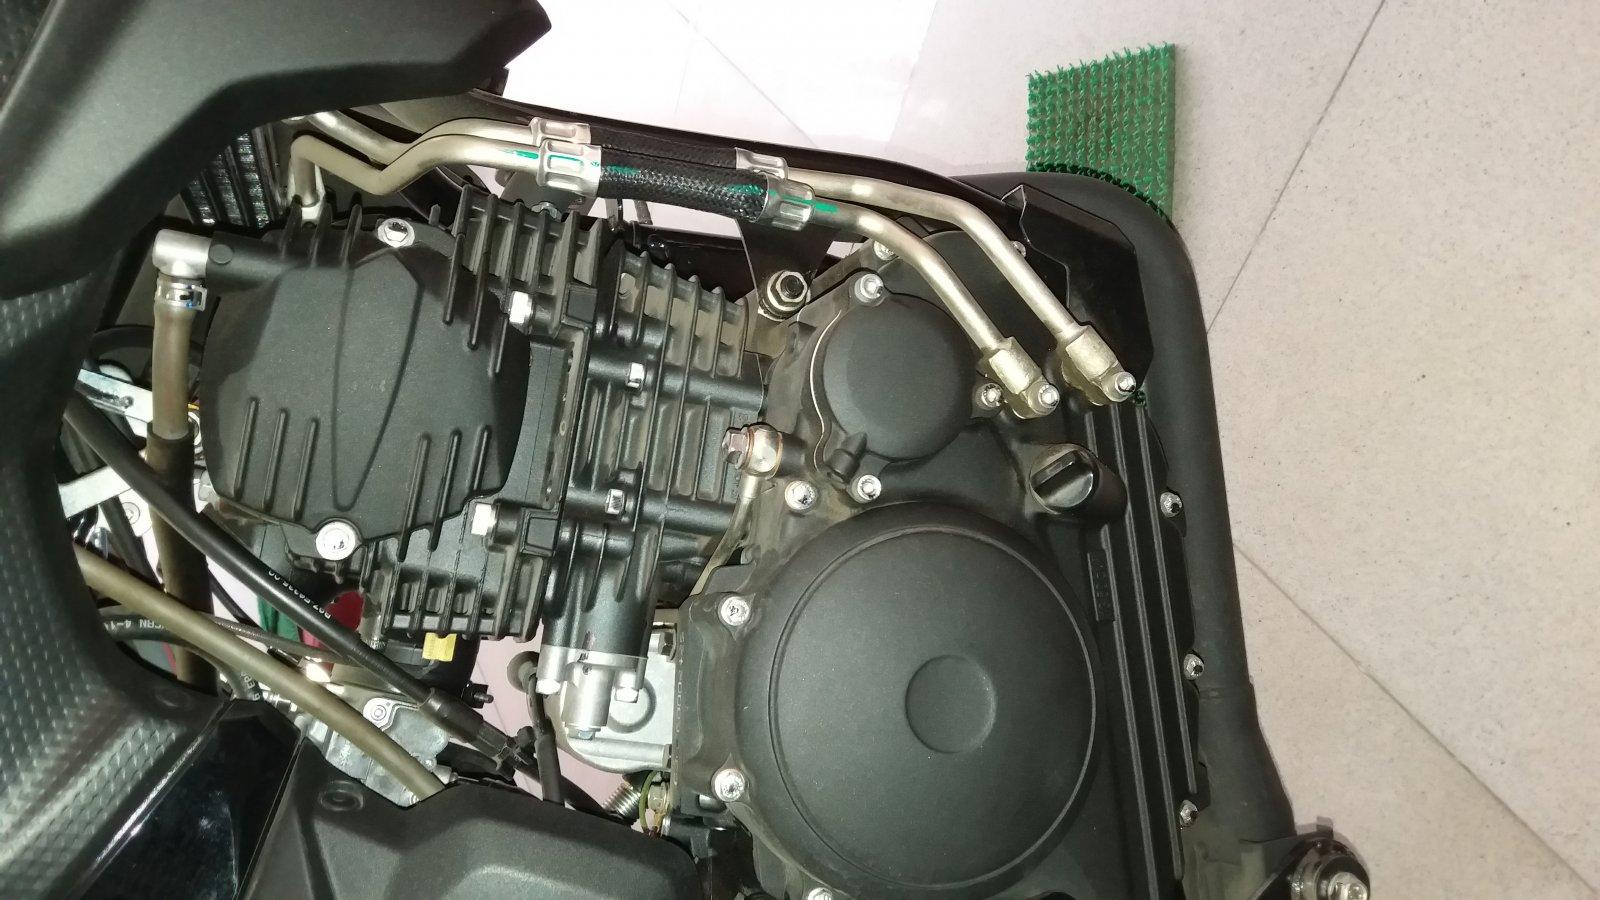 Yamaha FZ 25 ownership reviews & experiences   India Travel Forum